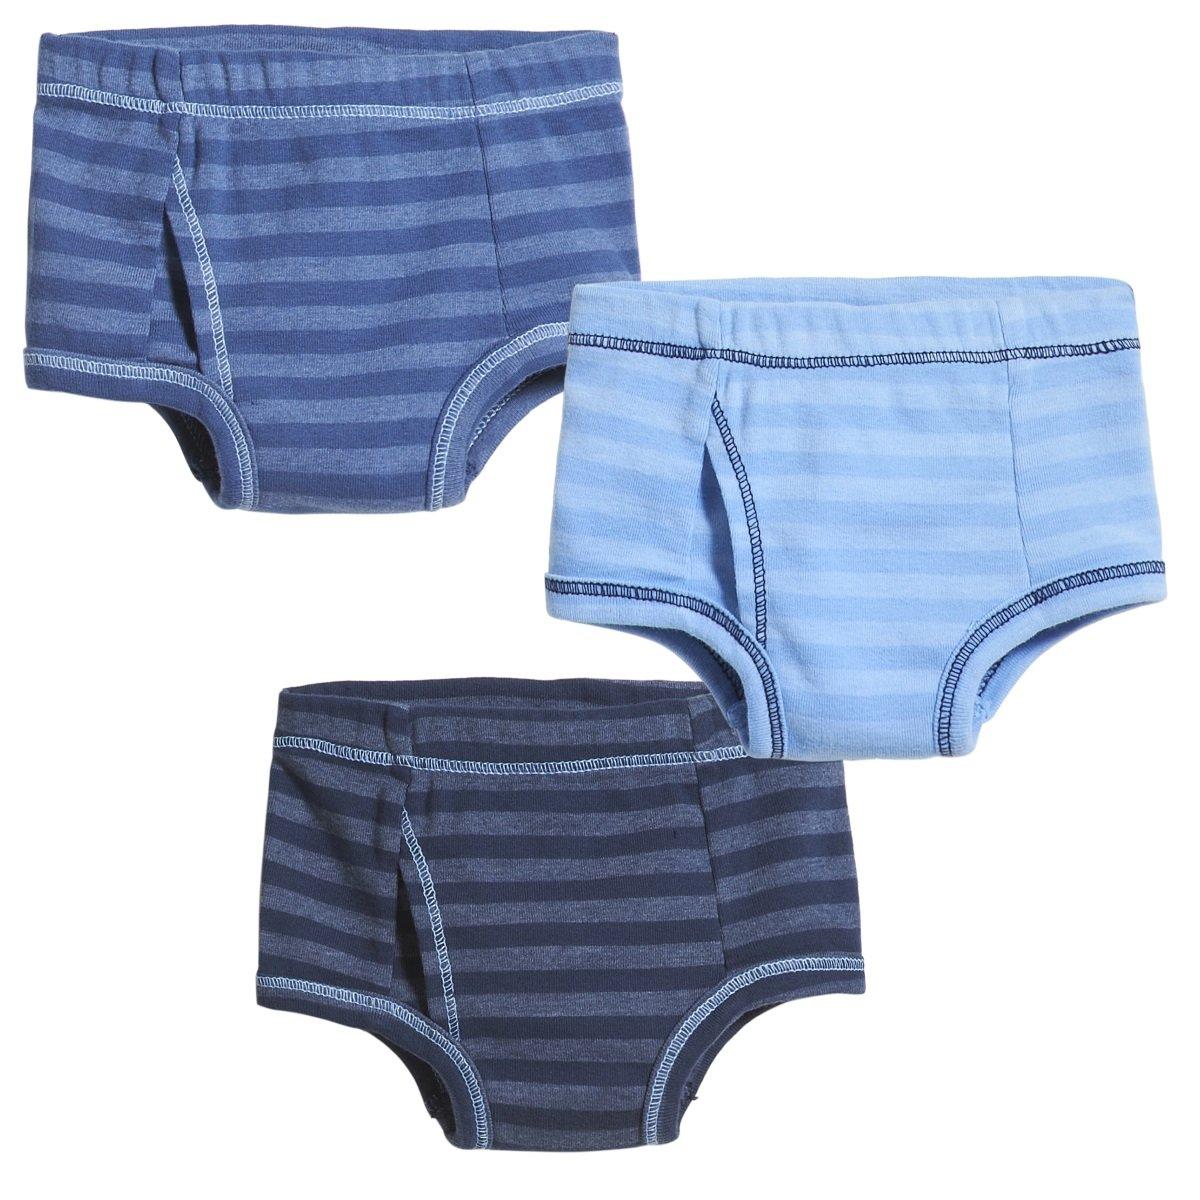 City Threads Boys' Brief Underwear Soft Cotton Perfect For Sensitive Skin Striped 3-Pack, Midnight/Smurf/Lt. Blue, 6